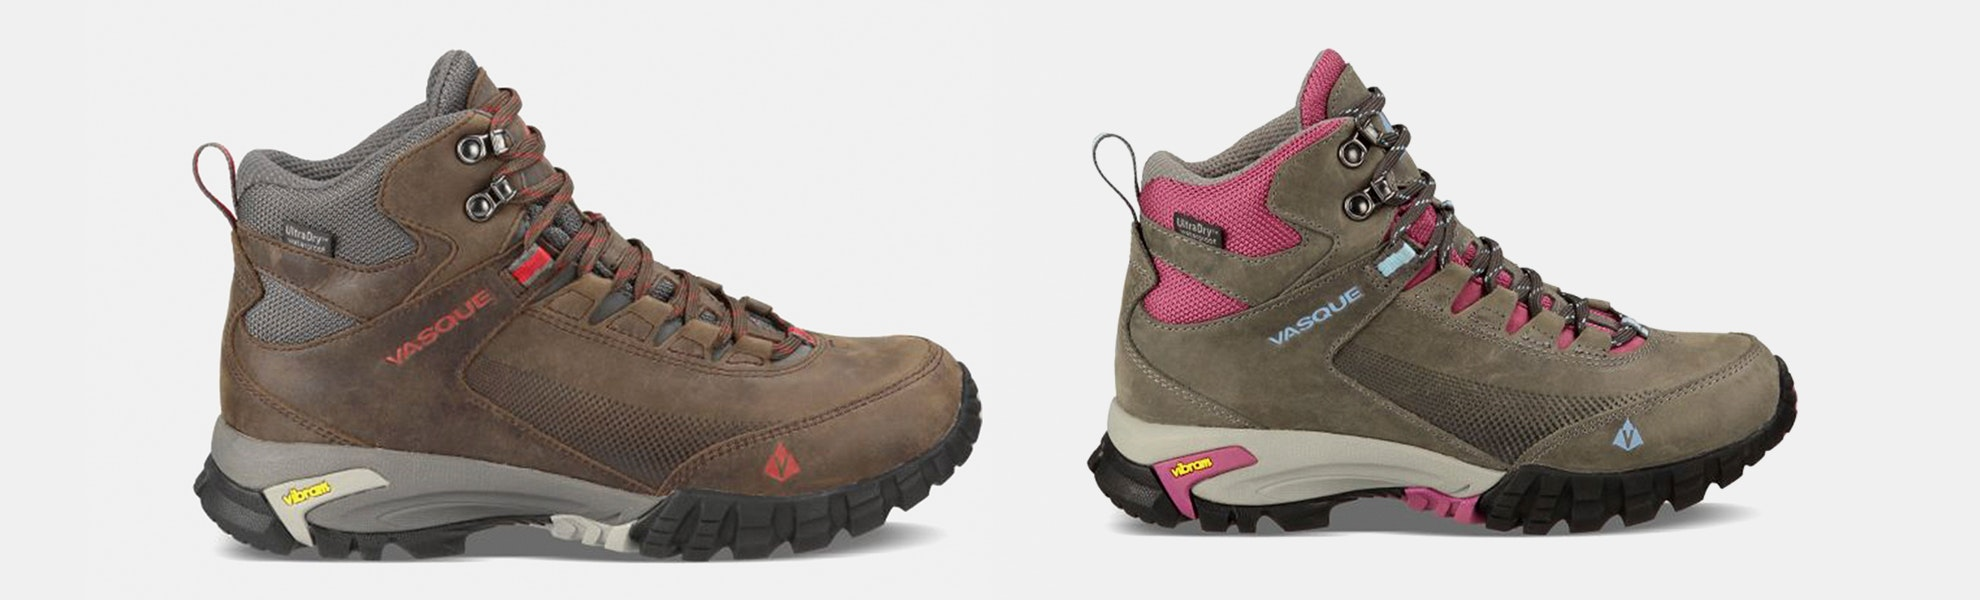 Vasque Talus Trek Hiking Boots